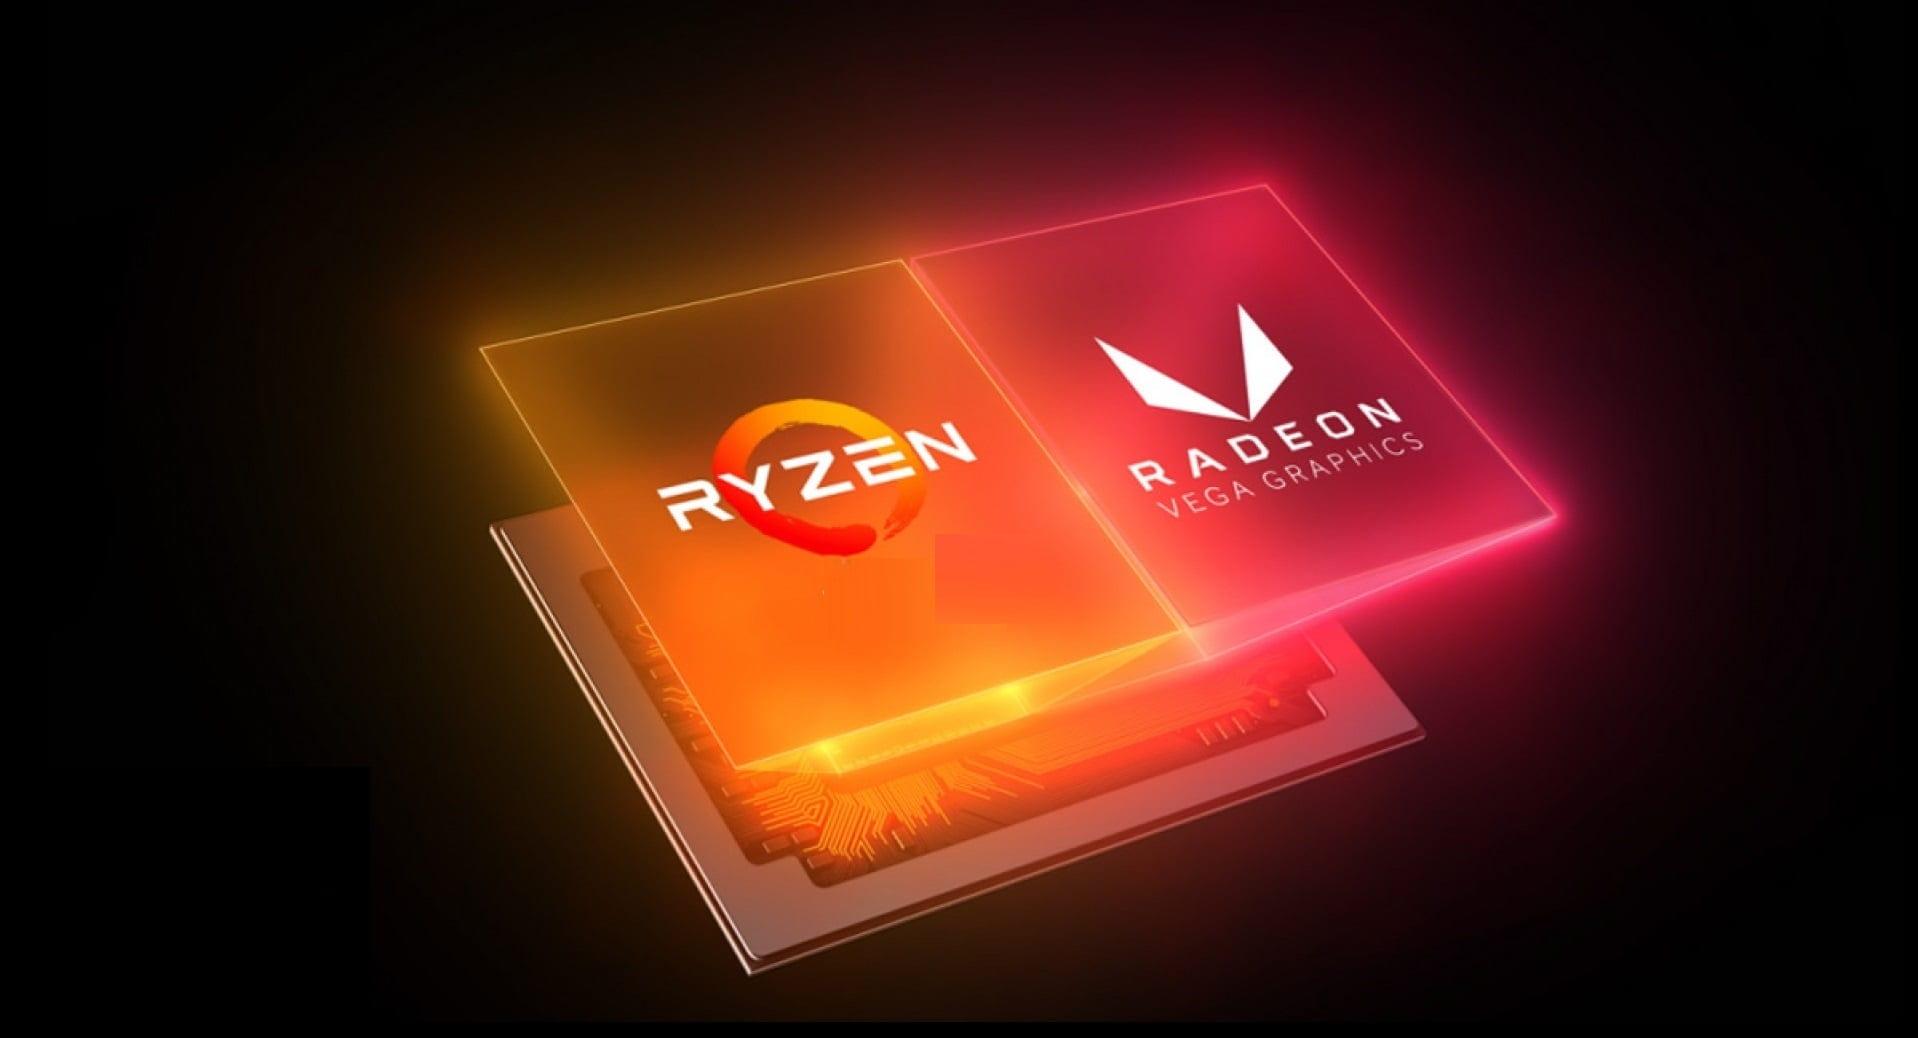 shar00750 установил два рекорда в модельных зачетах AMD Radeon R9 280X и Radeon R9 290